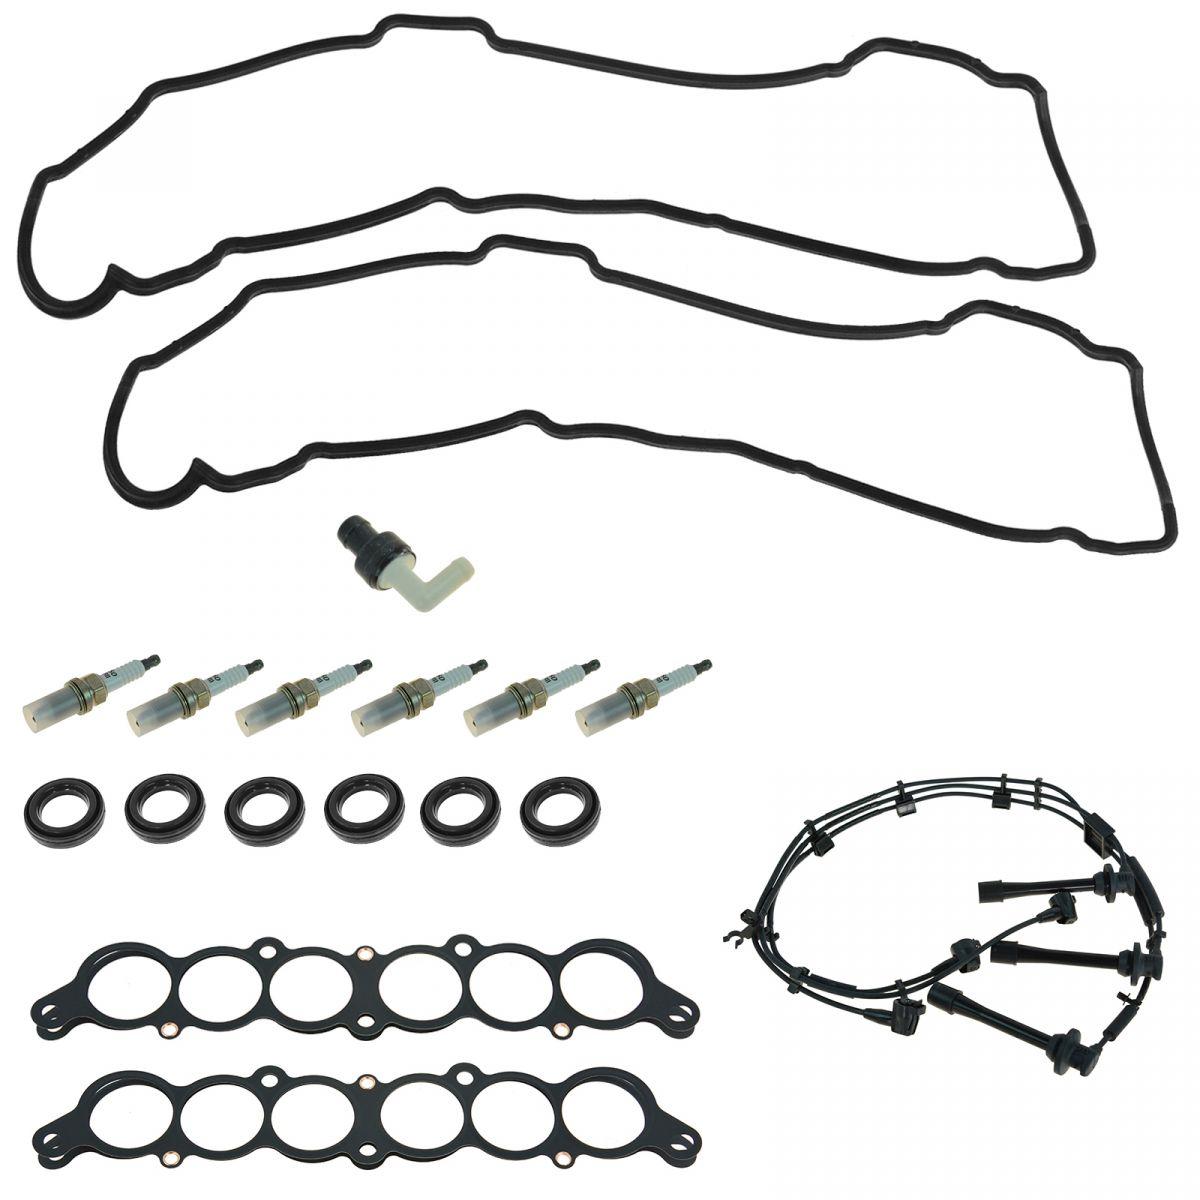 OEM Tune Up Kit & Gasket Set 18 Piece for Toyota Lexus V6